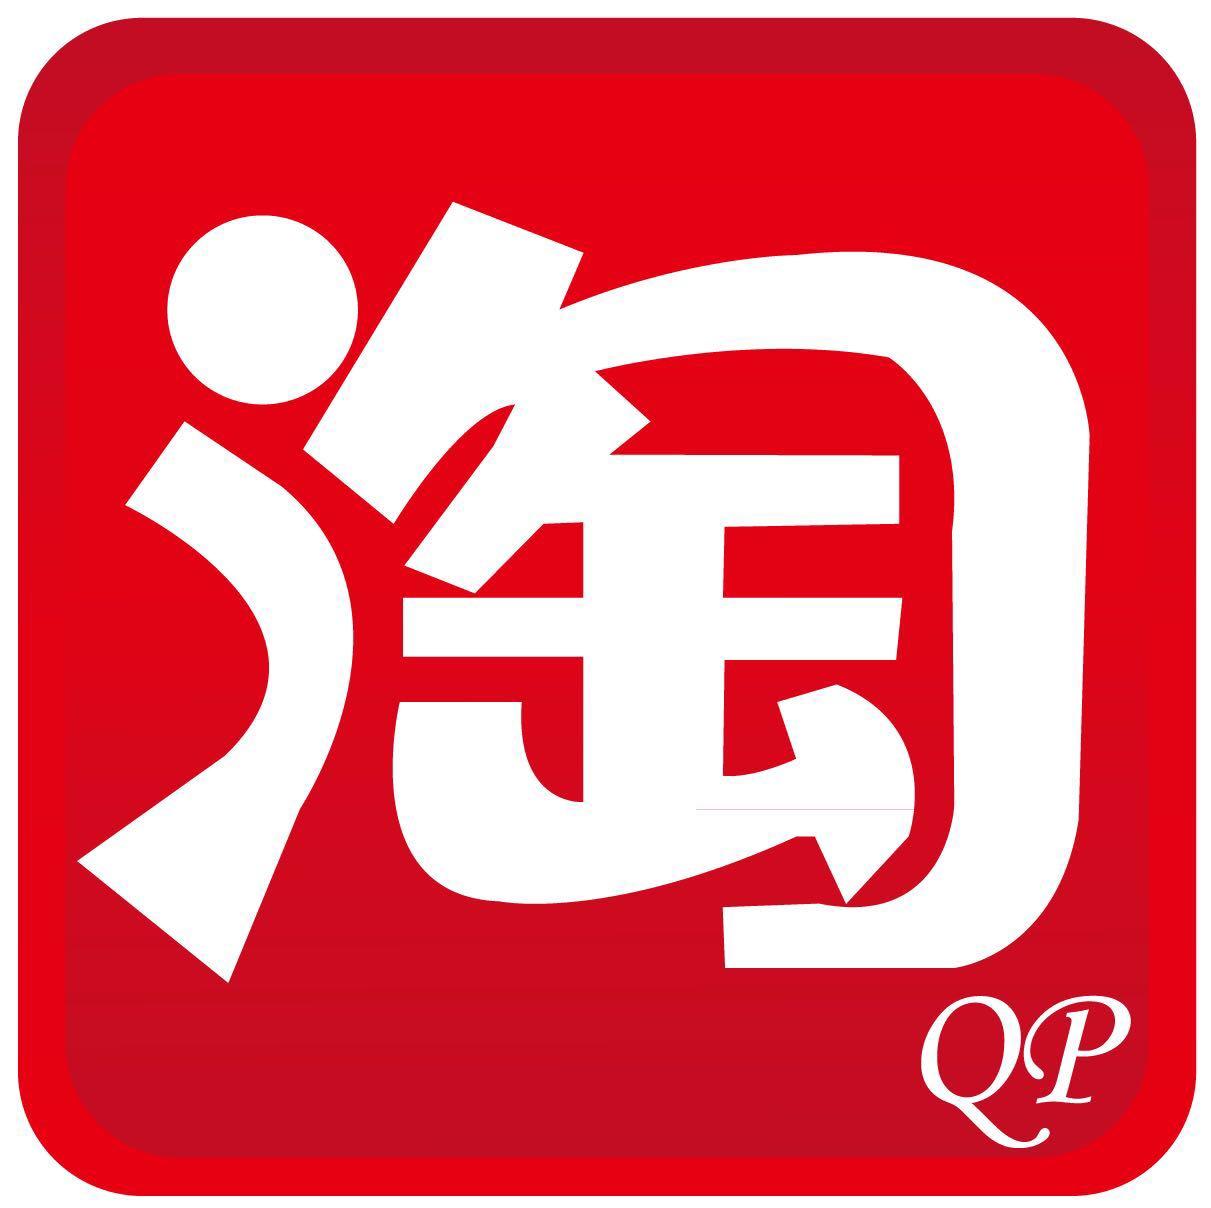 logo|装修公司logo设计|淘宝店铺图标图片大全|店铺logo设计在线生成